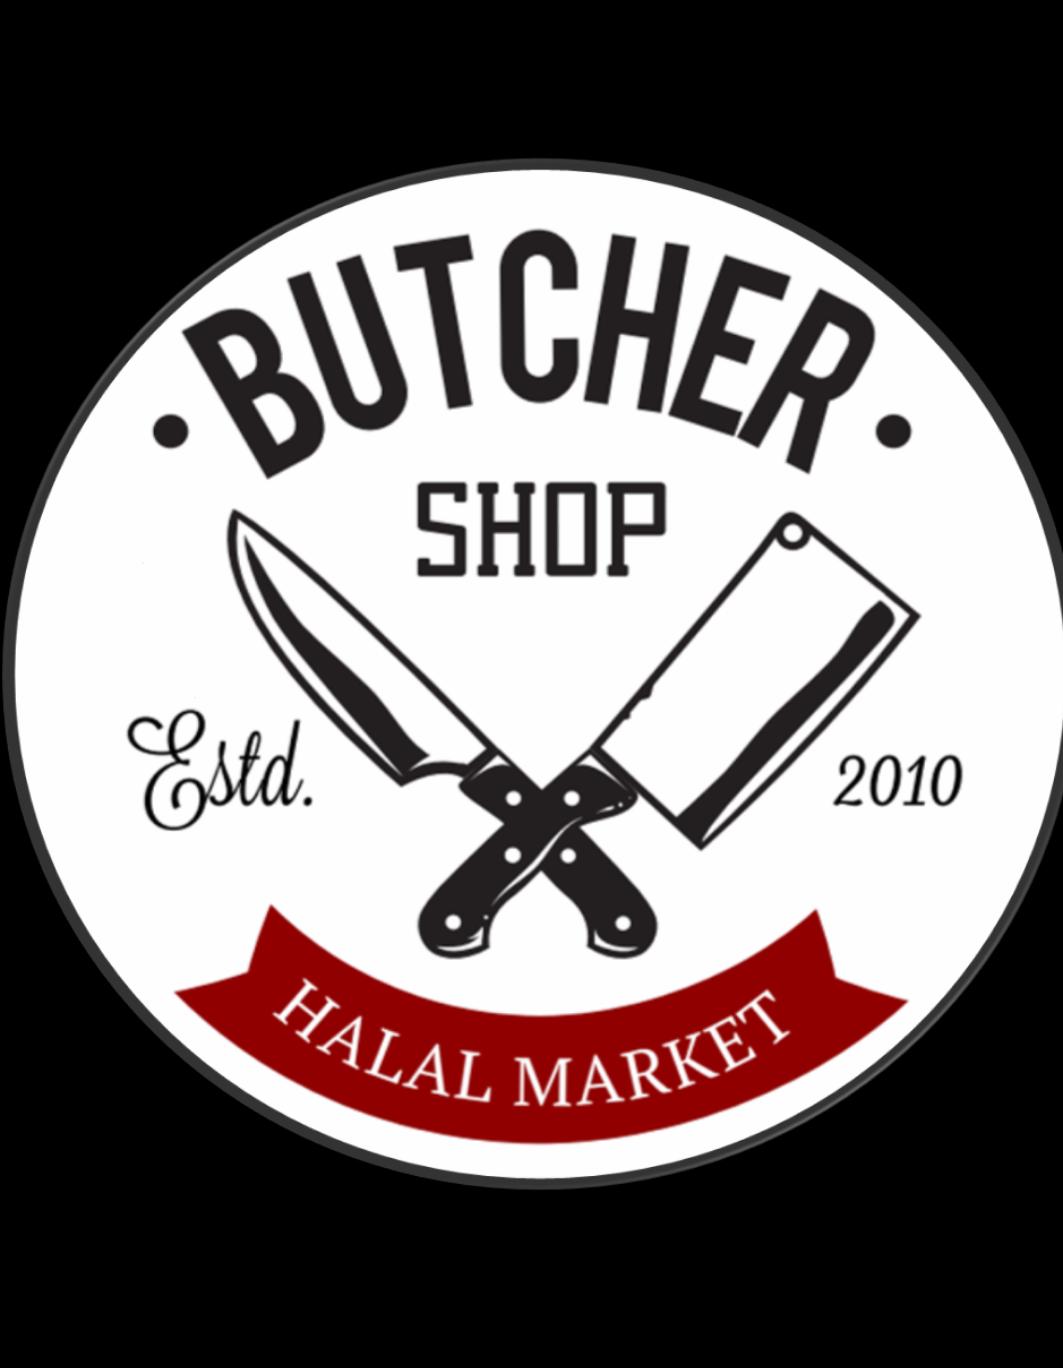 The Butcher Shop Halal Market logo